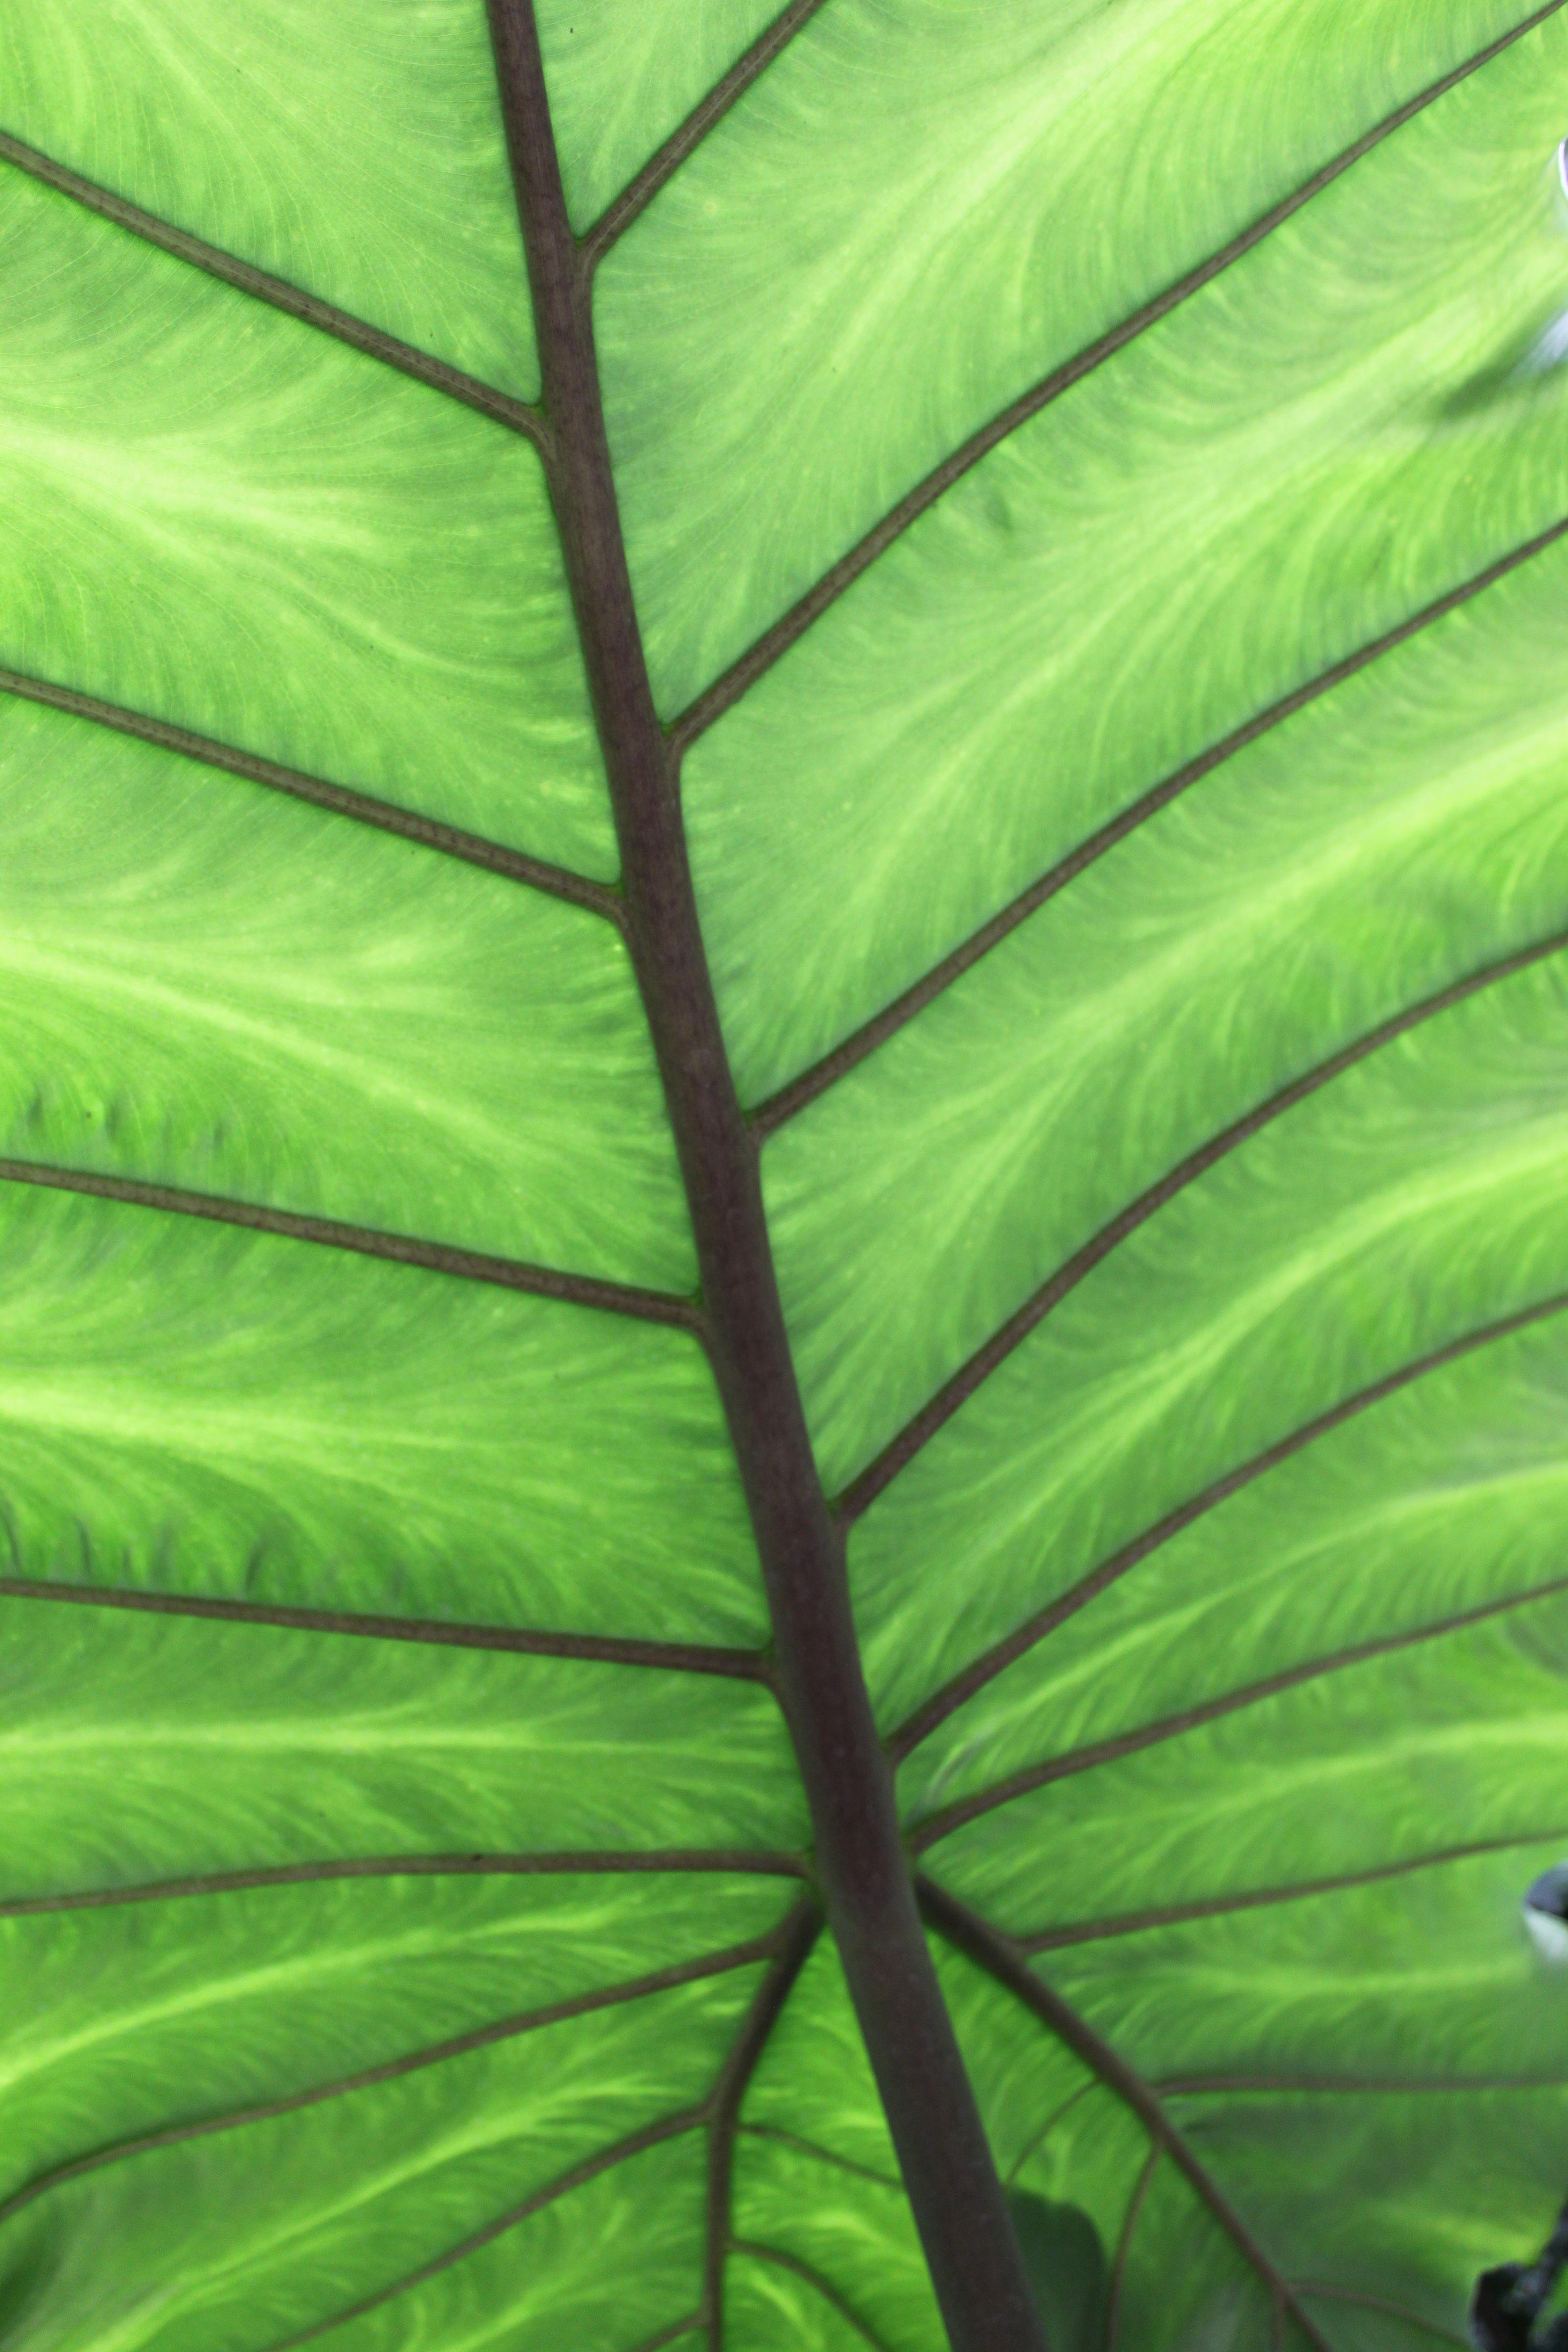 light through leaf | Garden services, Plant leaves ...